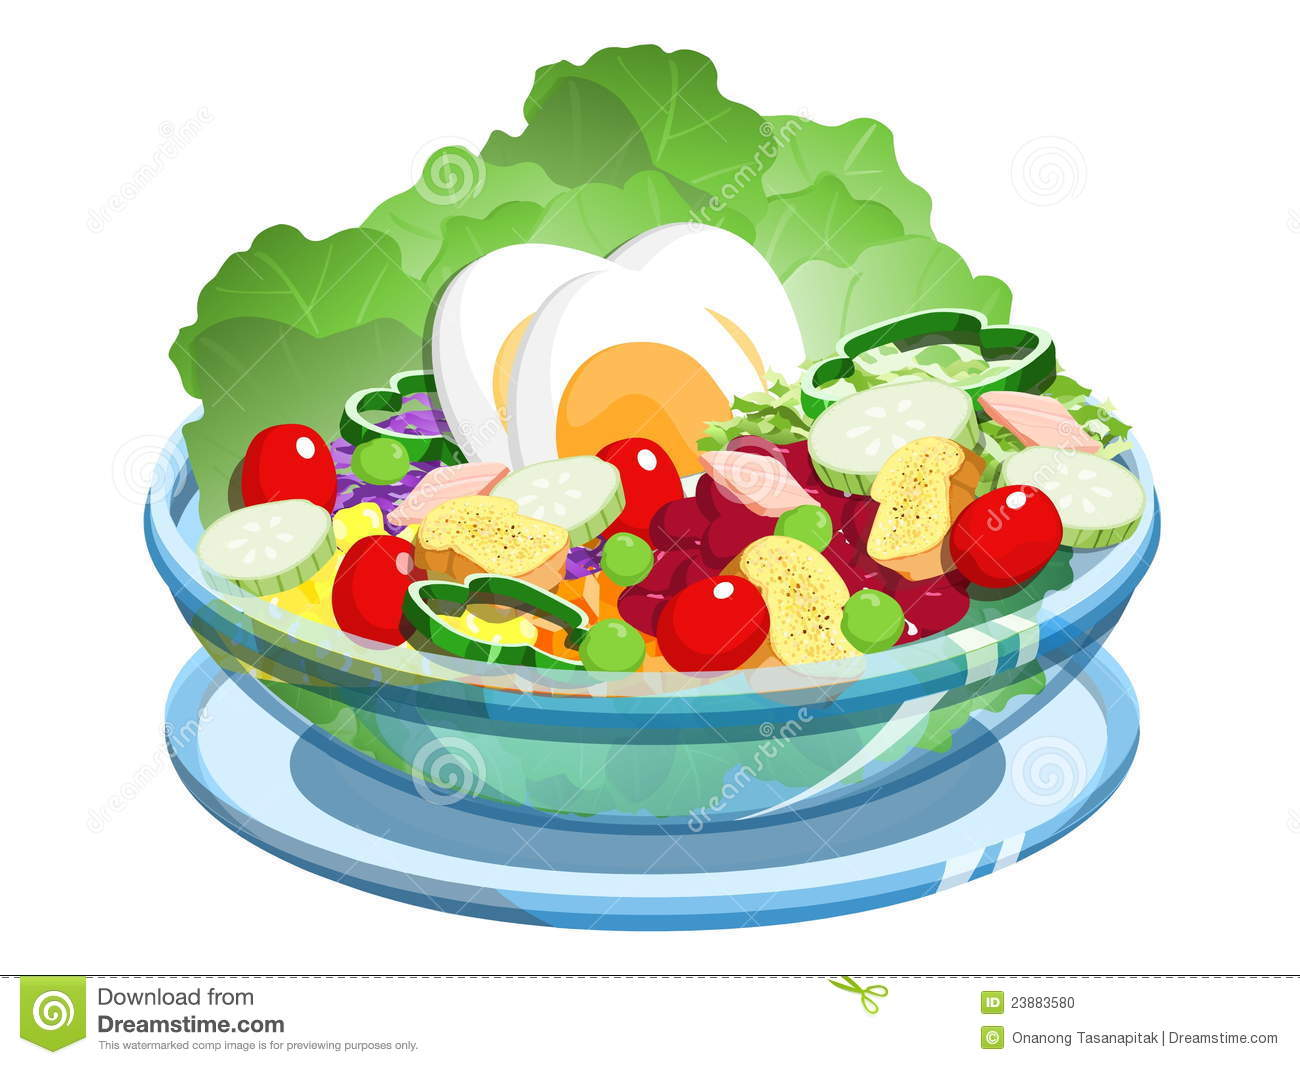 Salat clipart clipart free library Salat clipart 7 » Clipart Station clipart free library